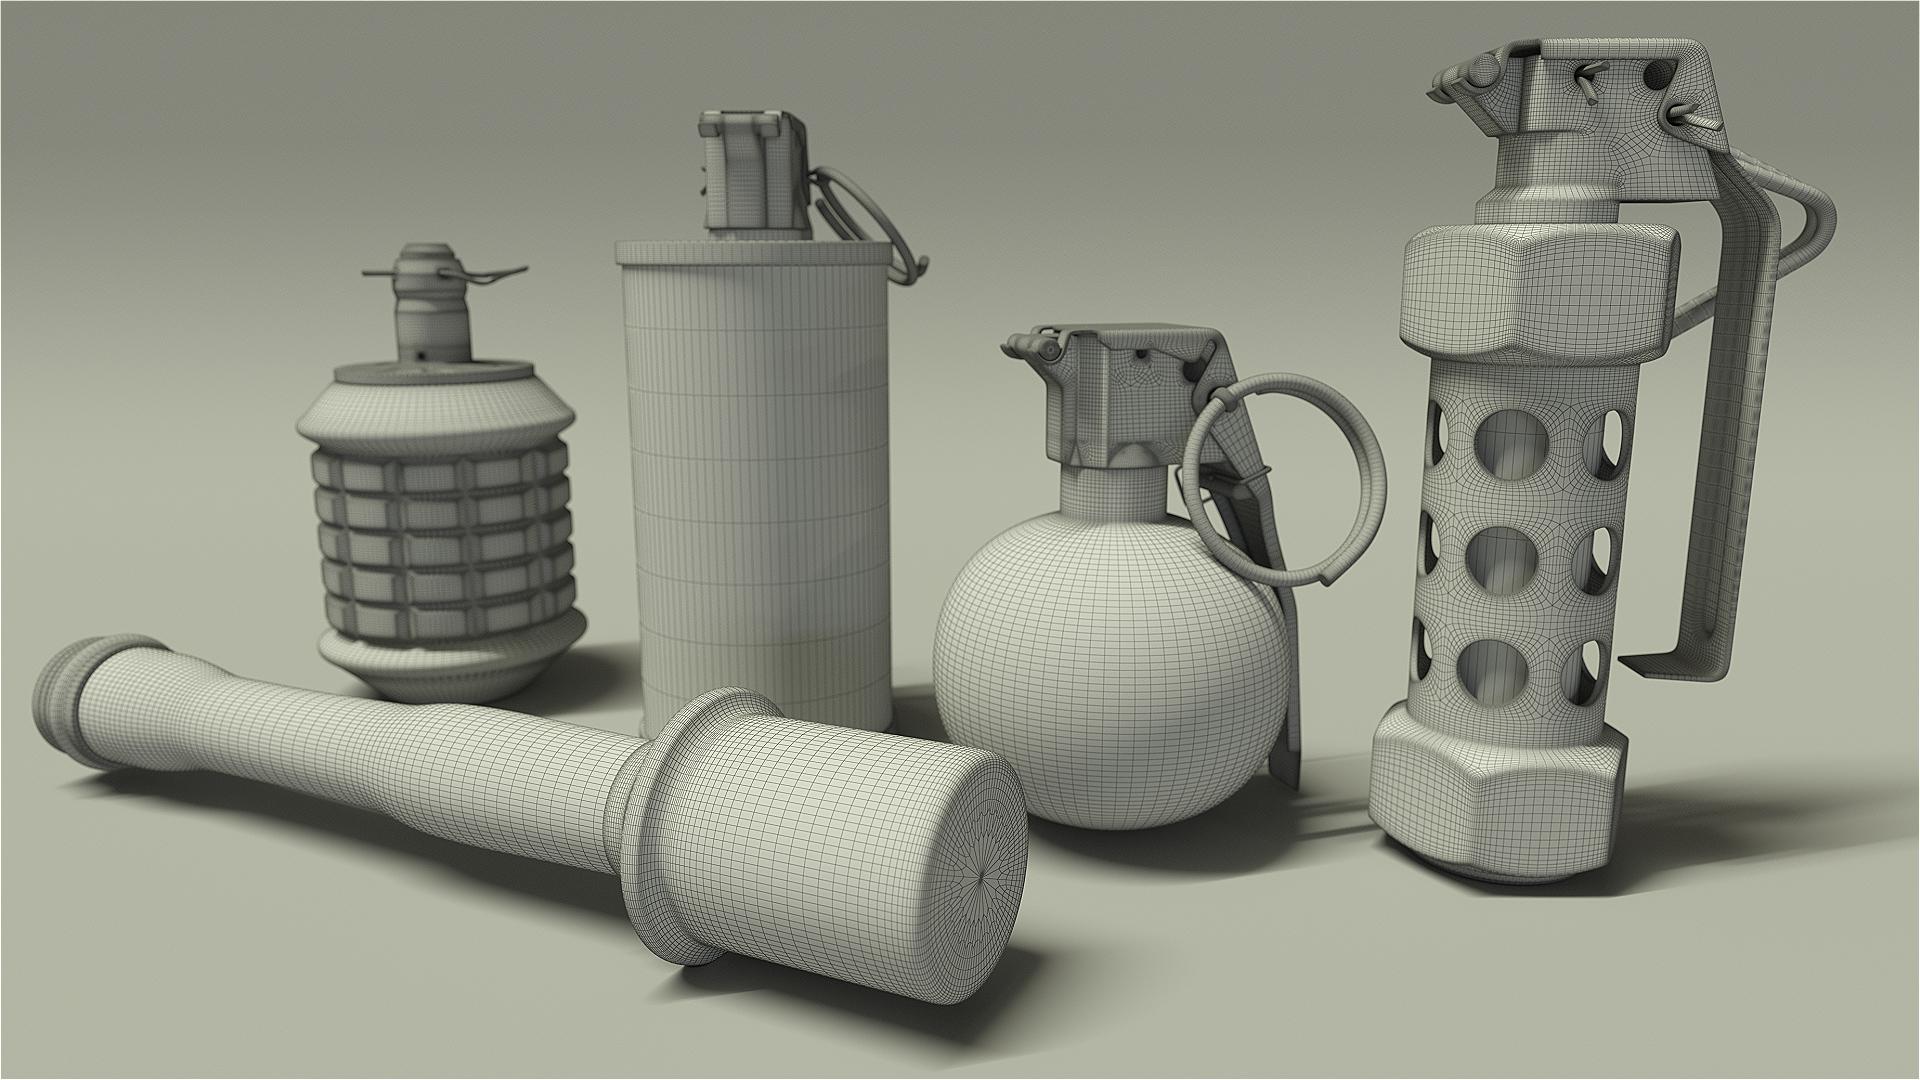 3D Model: Type 97 Grenade HD Render 2